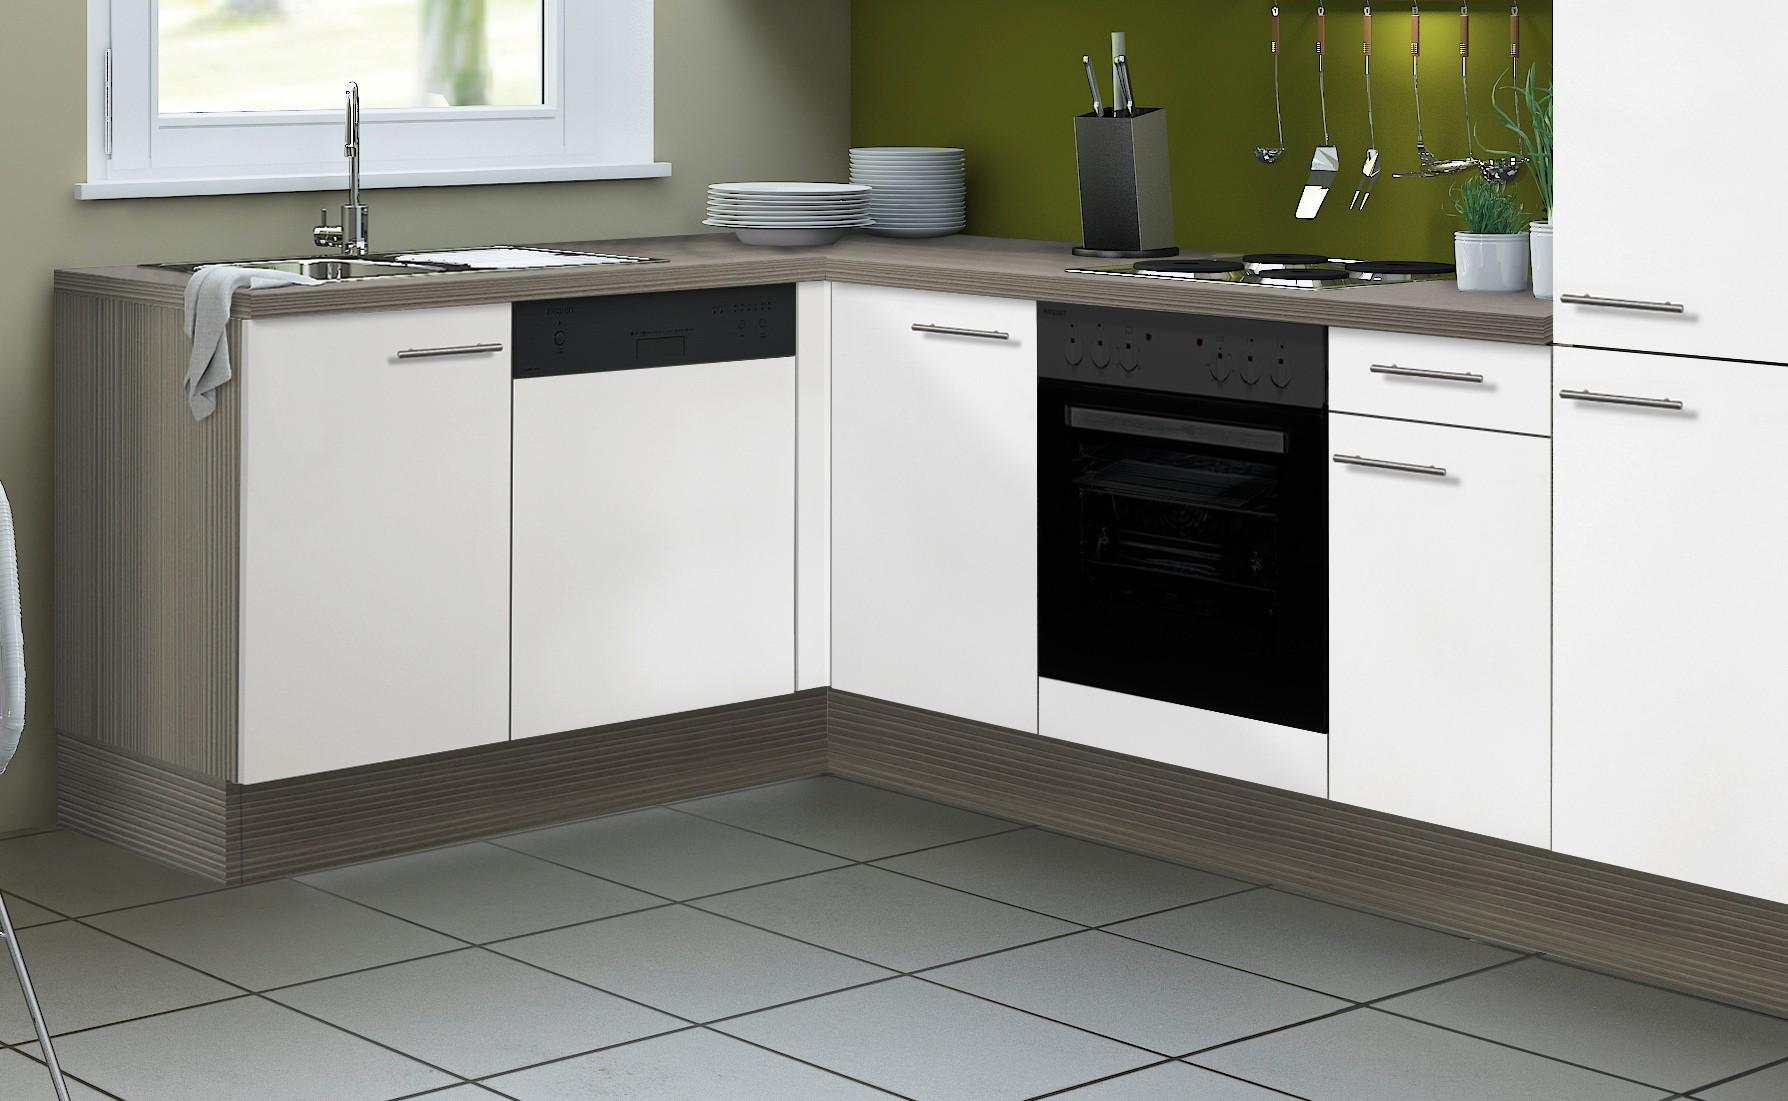 Eckküche CADIZ - Vario 2 - L-Küche ohne E-Geräte - Breite 270 x 175 ...